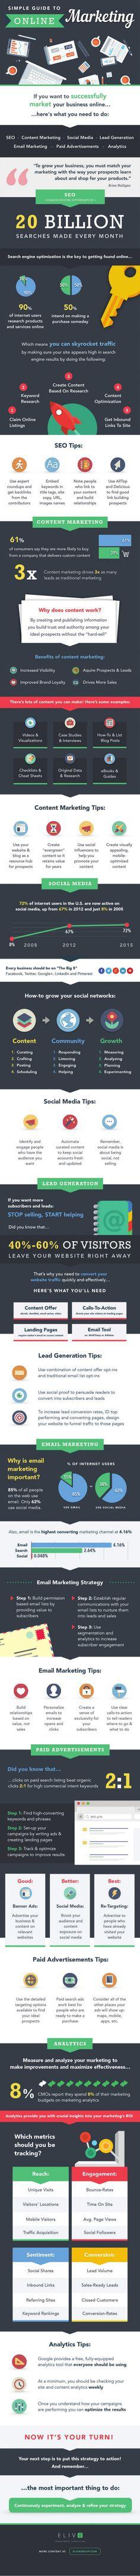 Guía de #Marketing #Online #infografia